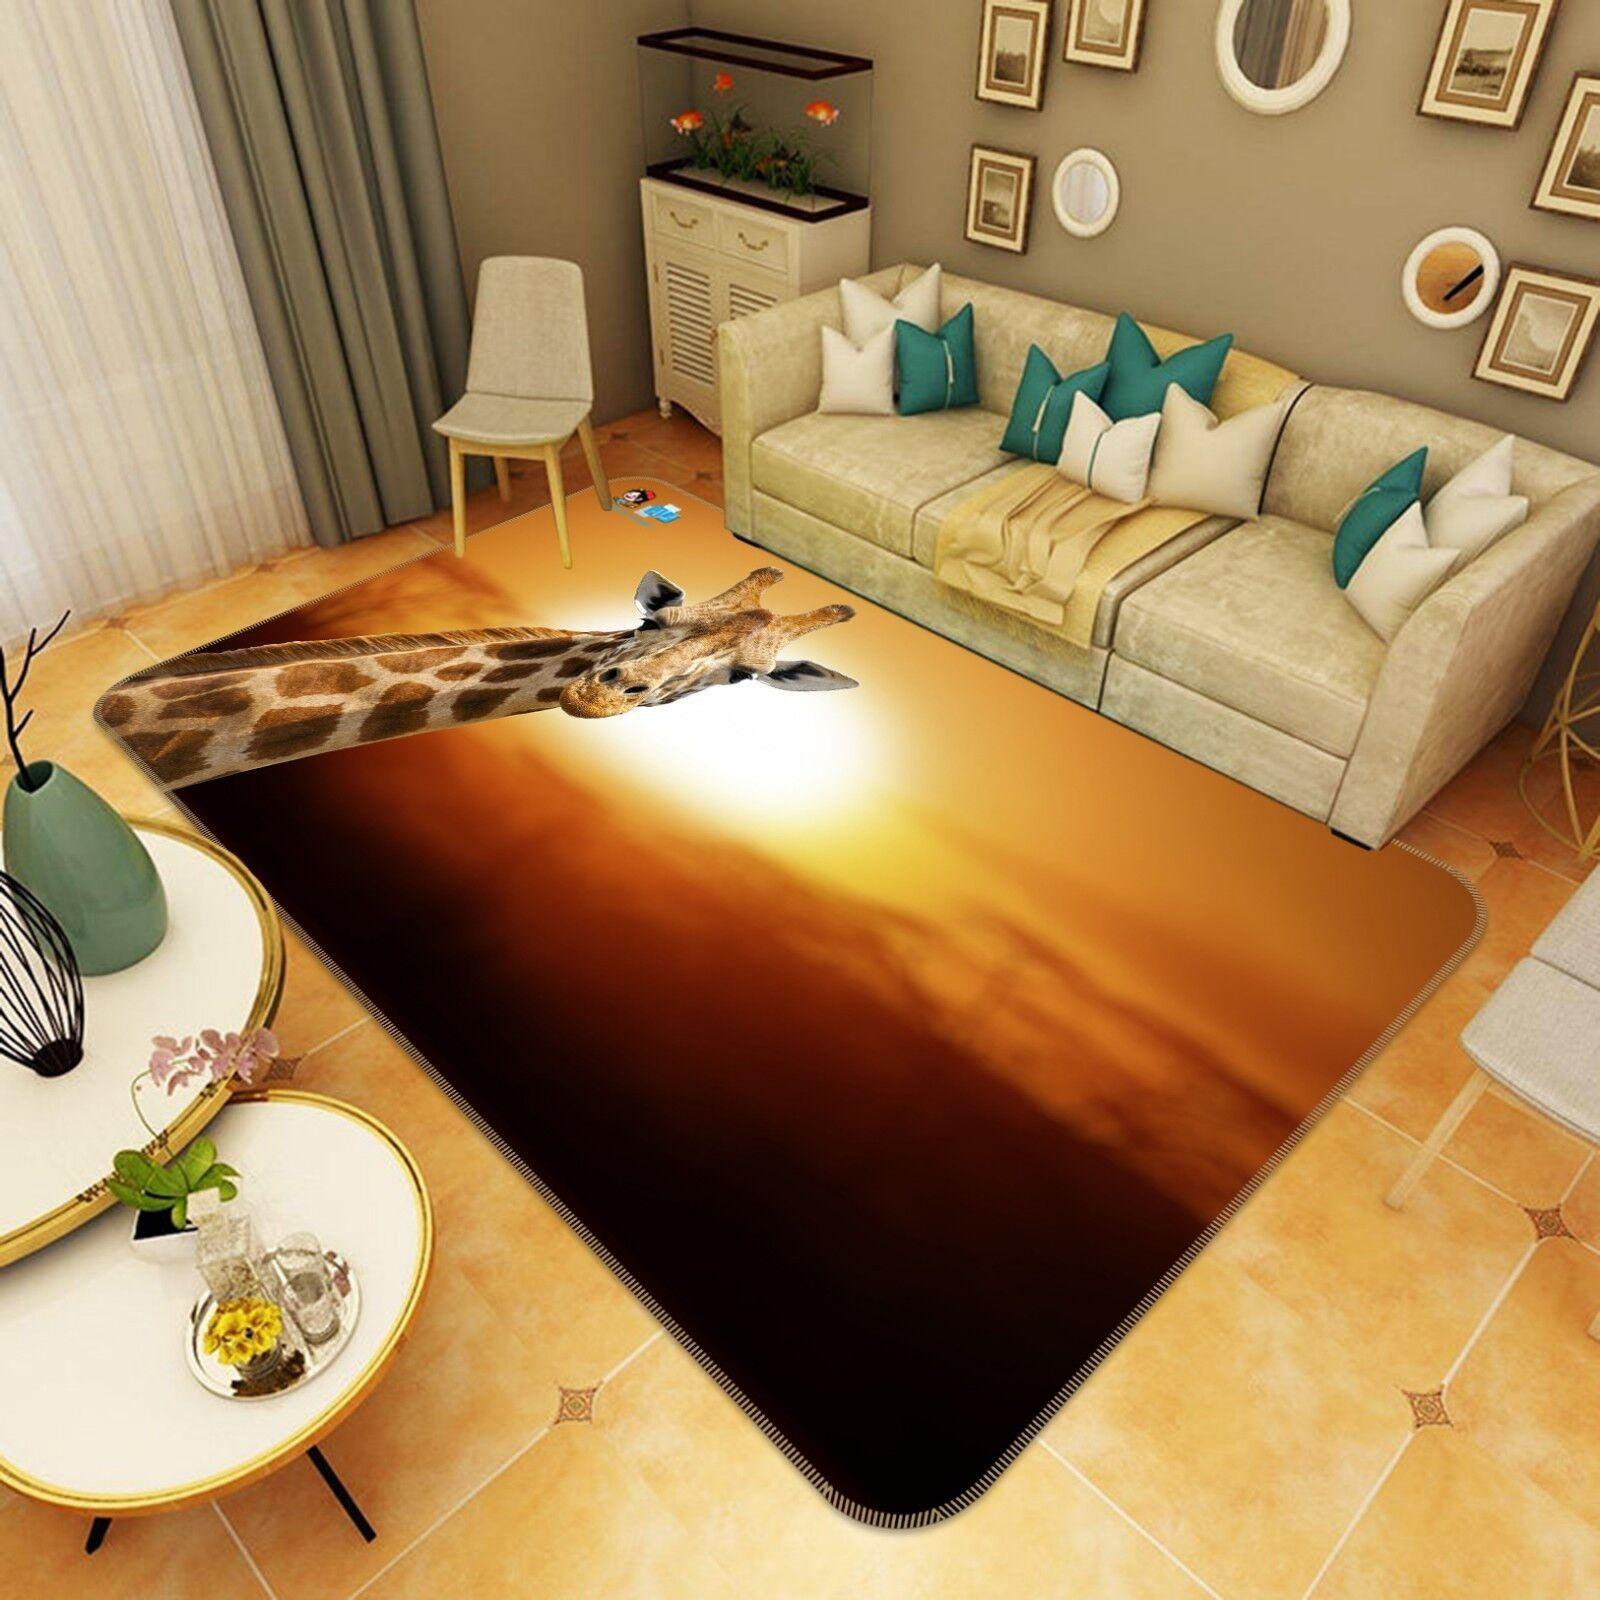 3D Sunlight Giraffe 77 Non Non Non Slip Rug Mat Room Mat Quality Elegant Photo Carpet US b677ea